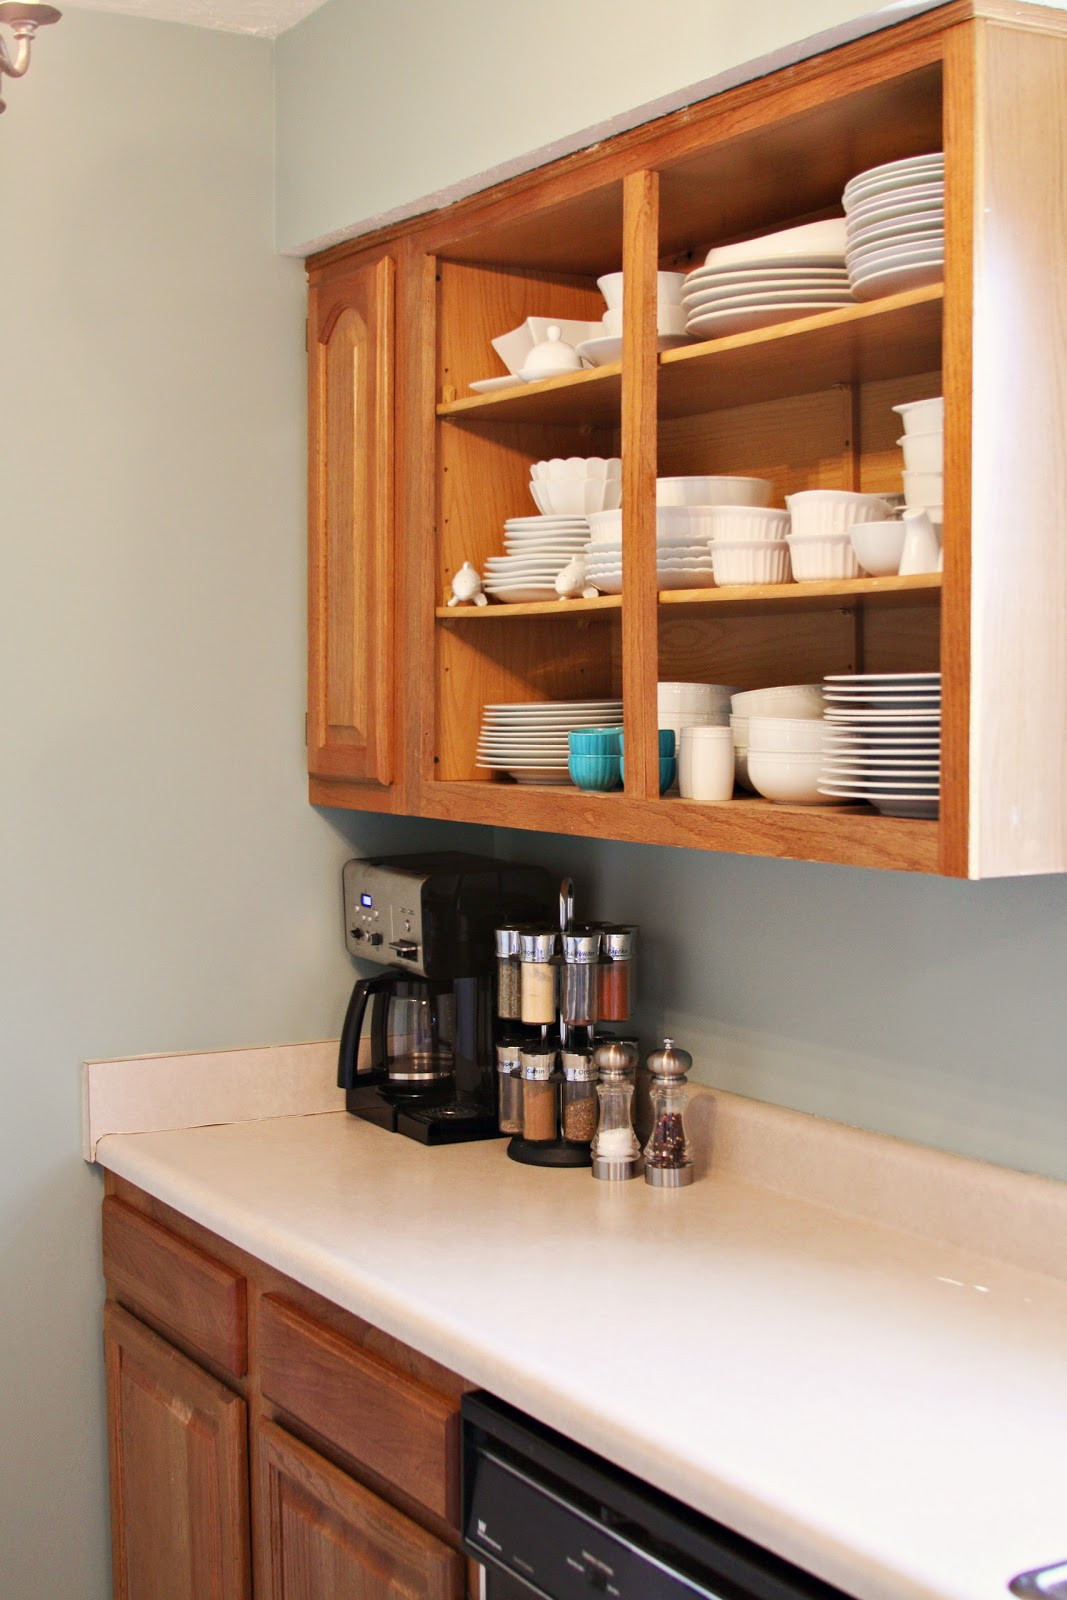 Casa de Luna Creations: Open Shelving Cabinets